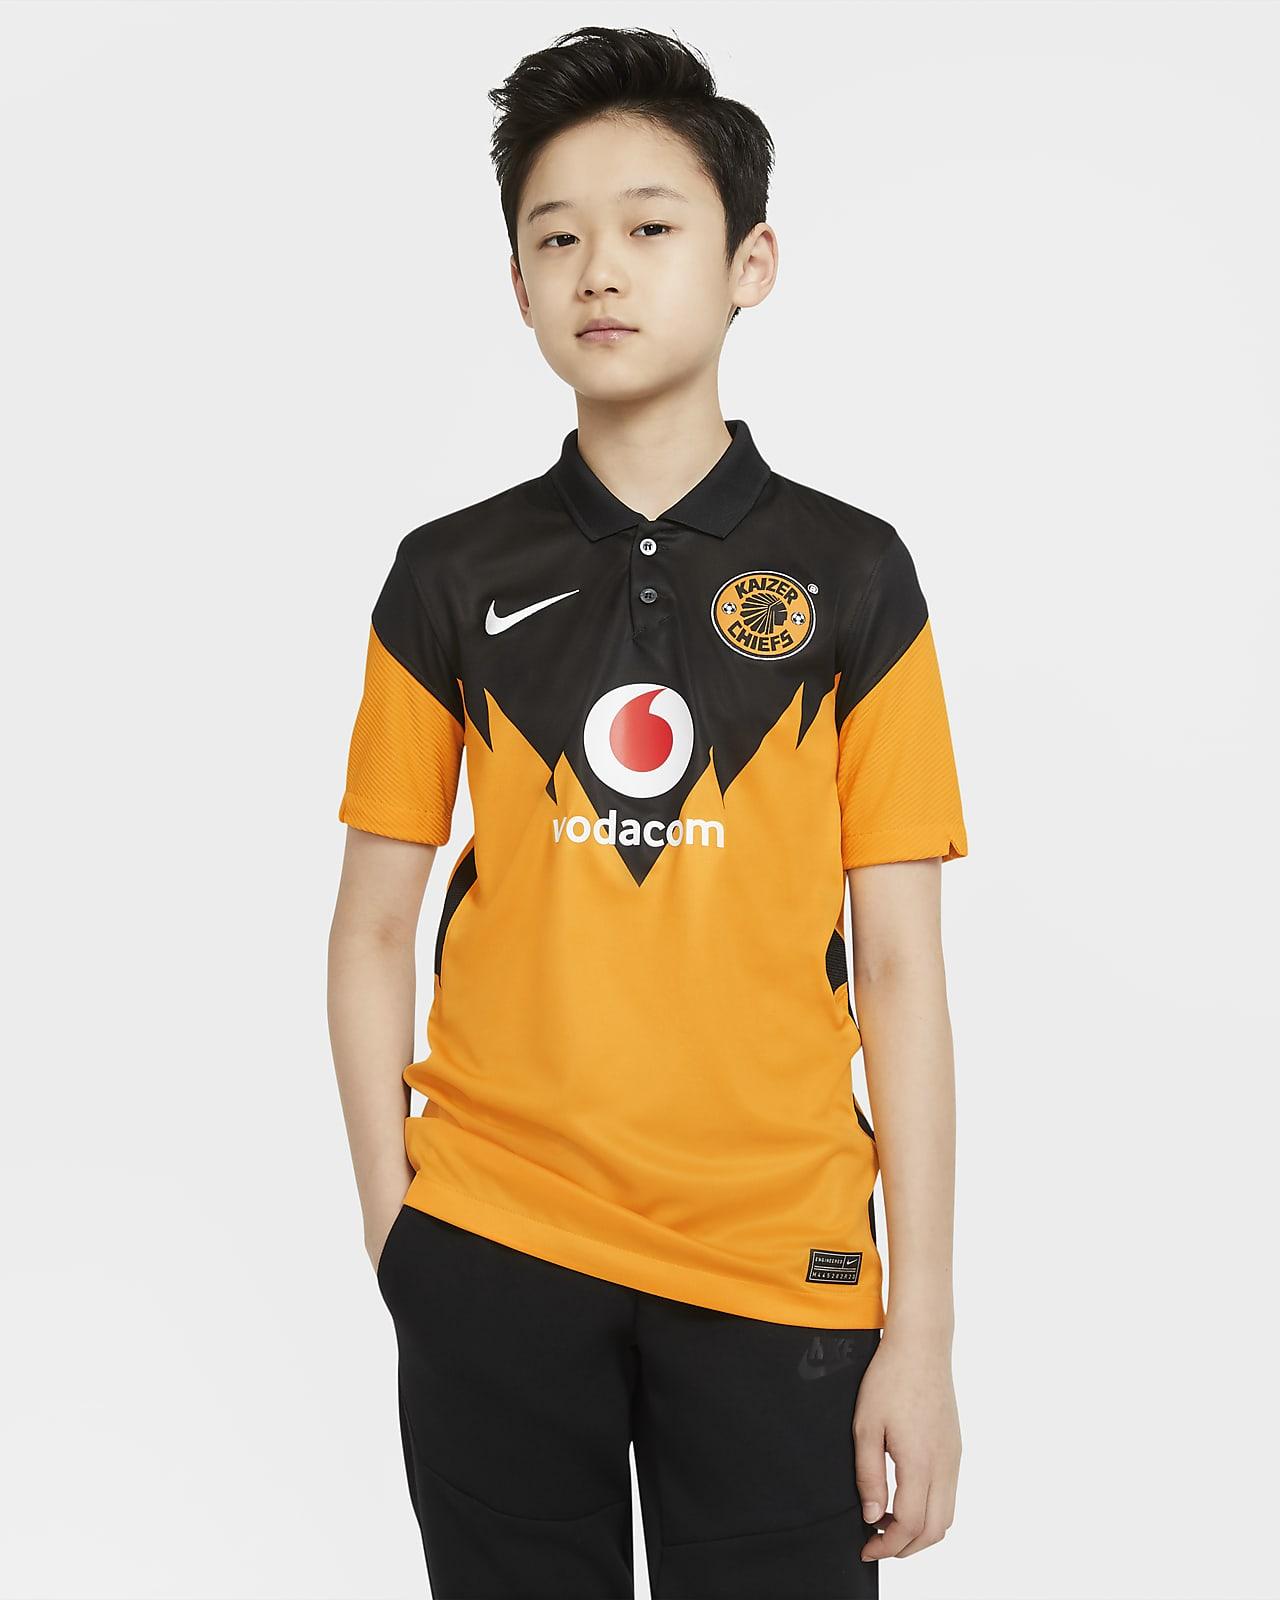 Kaizer Chiefs F.C. 2020/21 Stadium Home Older Kids' Football Shirt